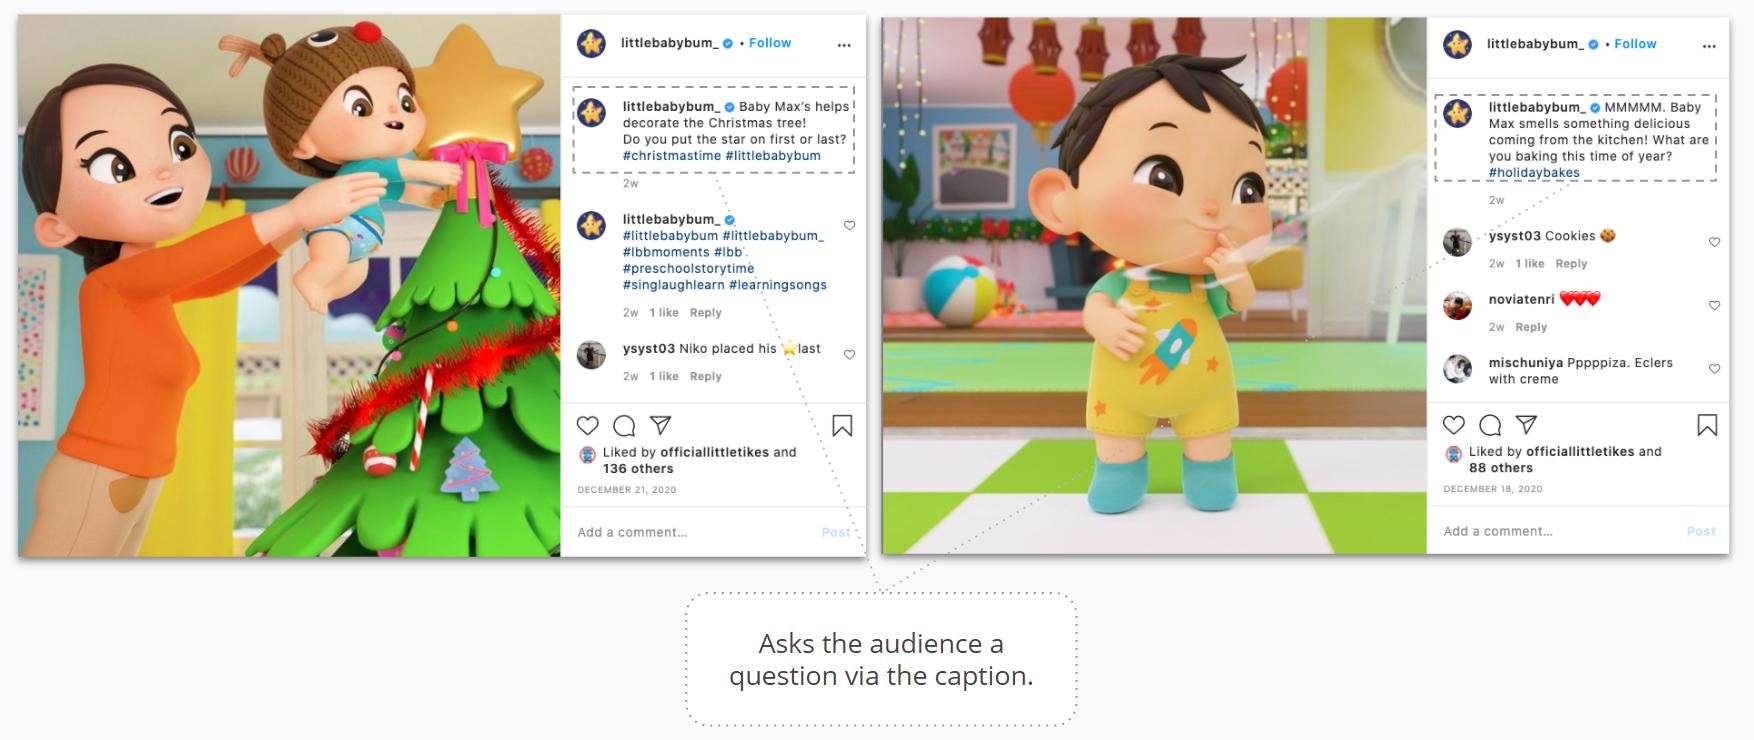 Little Baby Bum - Instagram - Asks the audience a question via the caption